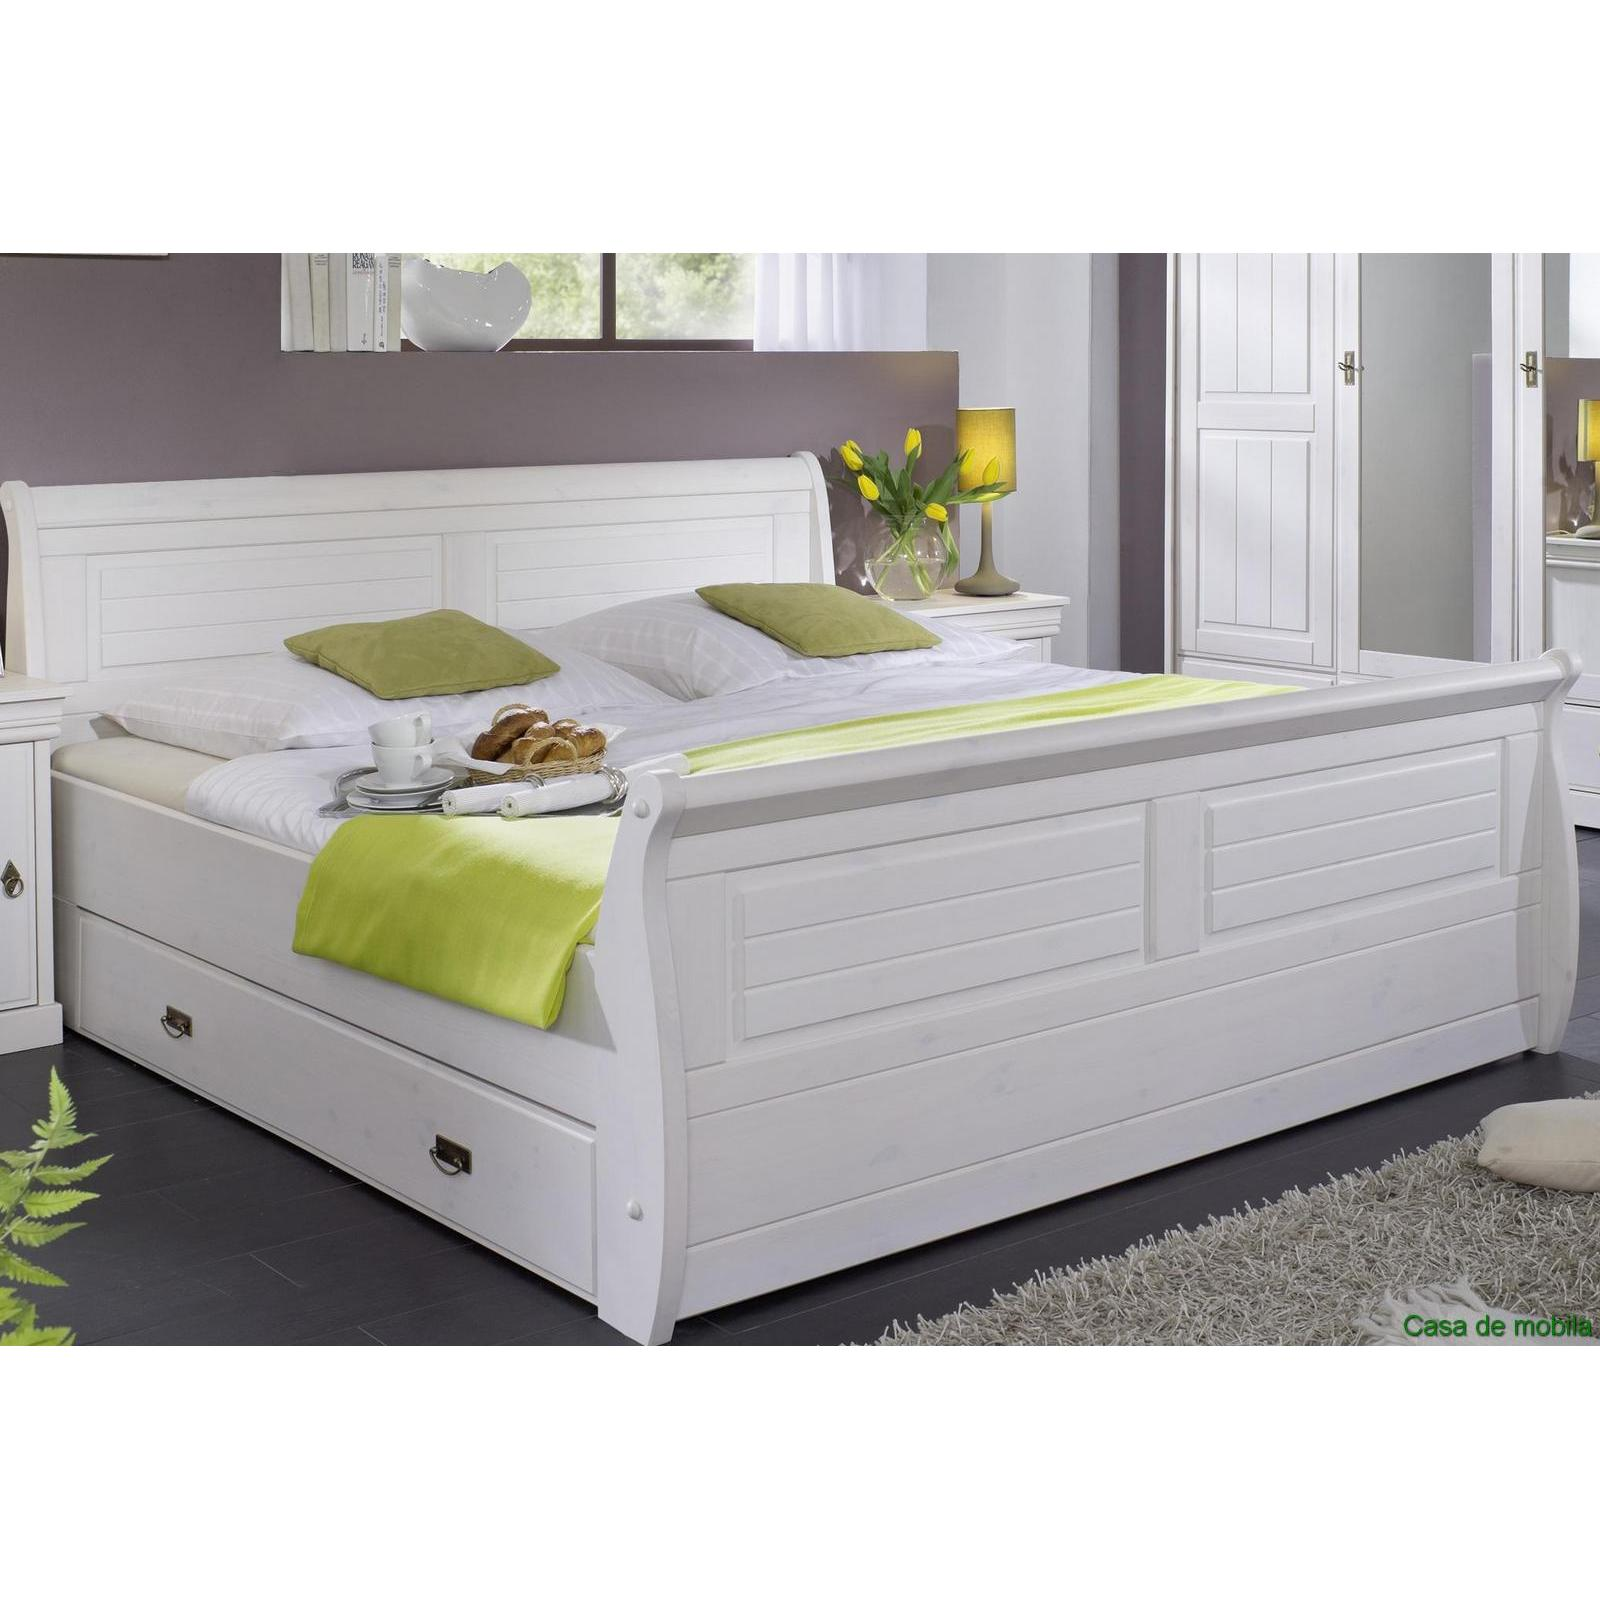 massivholz schlafzimmer kiefer komplett 4 teilig rom wei gewachst. Black Bedroom Furniture Sets. Home Design Ideas